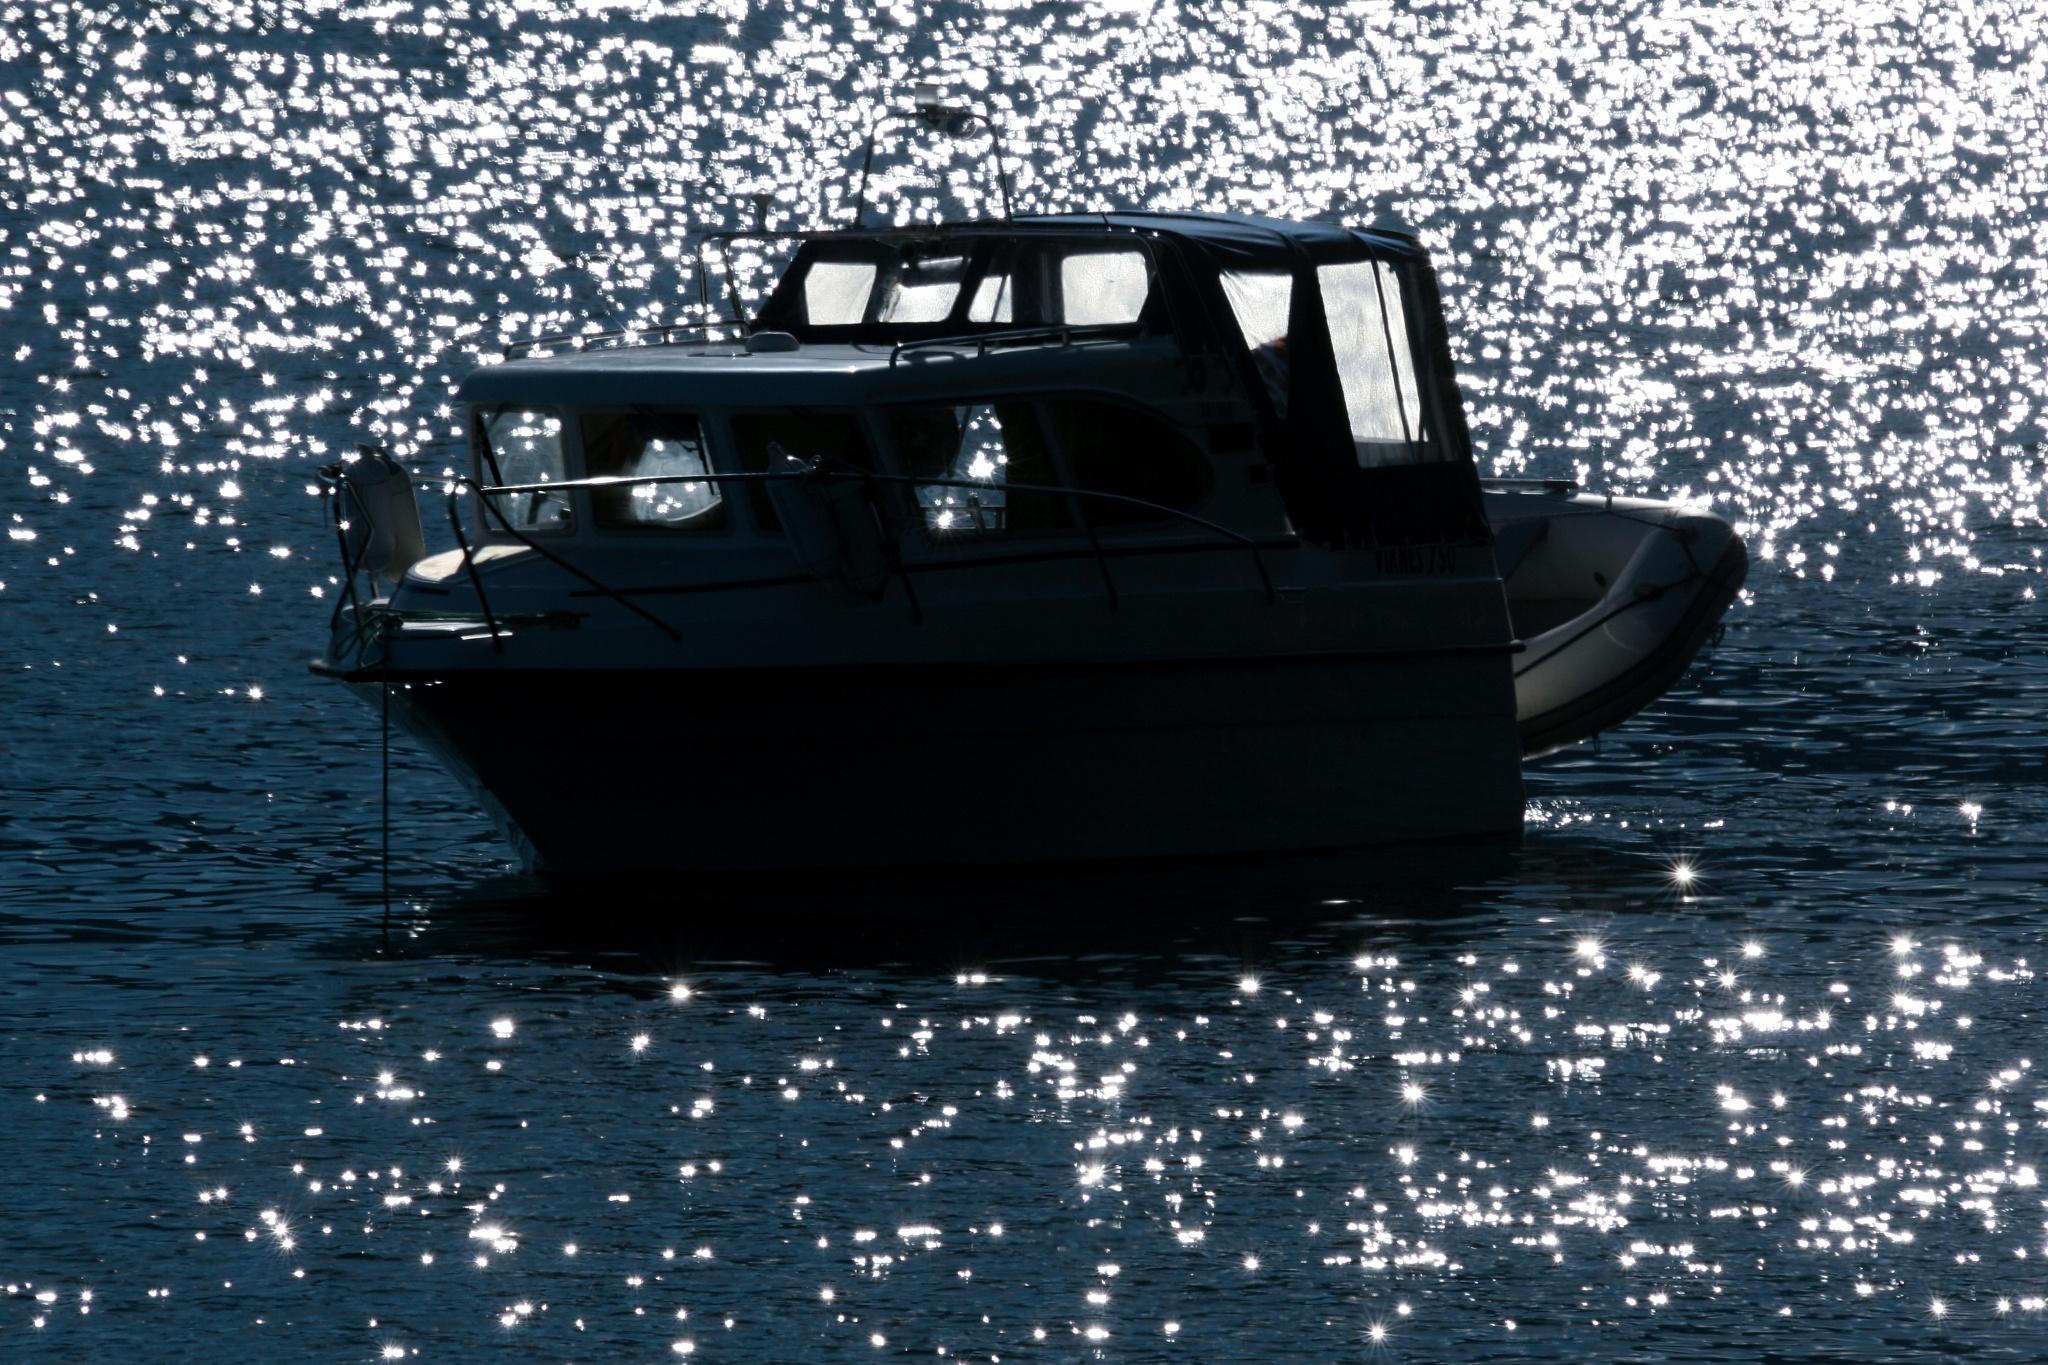 Idyllic sea life by sveinsen